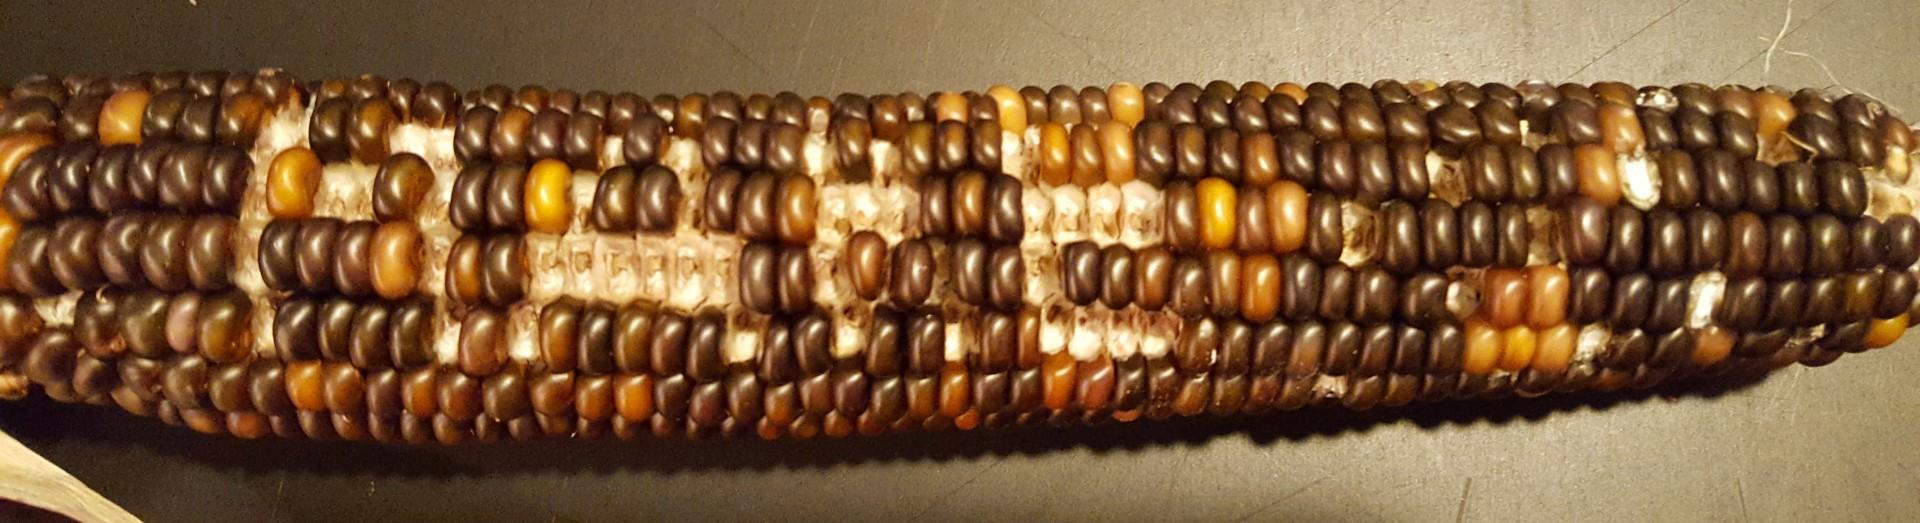 Math Monday: Create Pixel Art with Corn